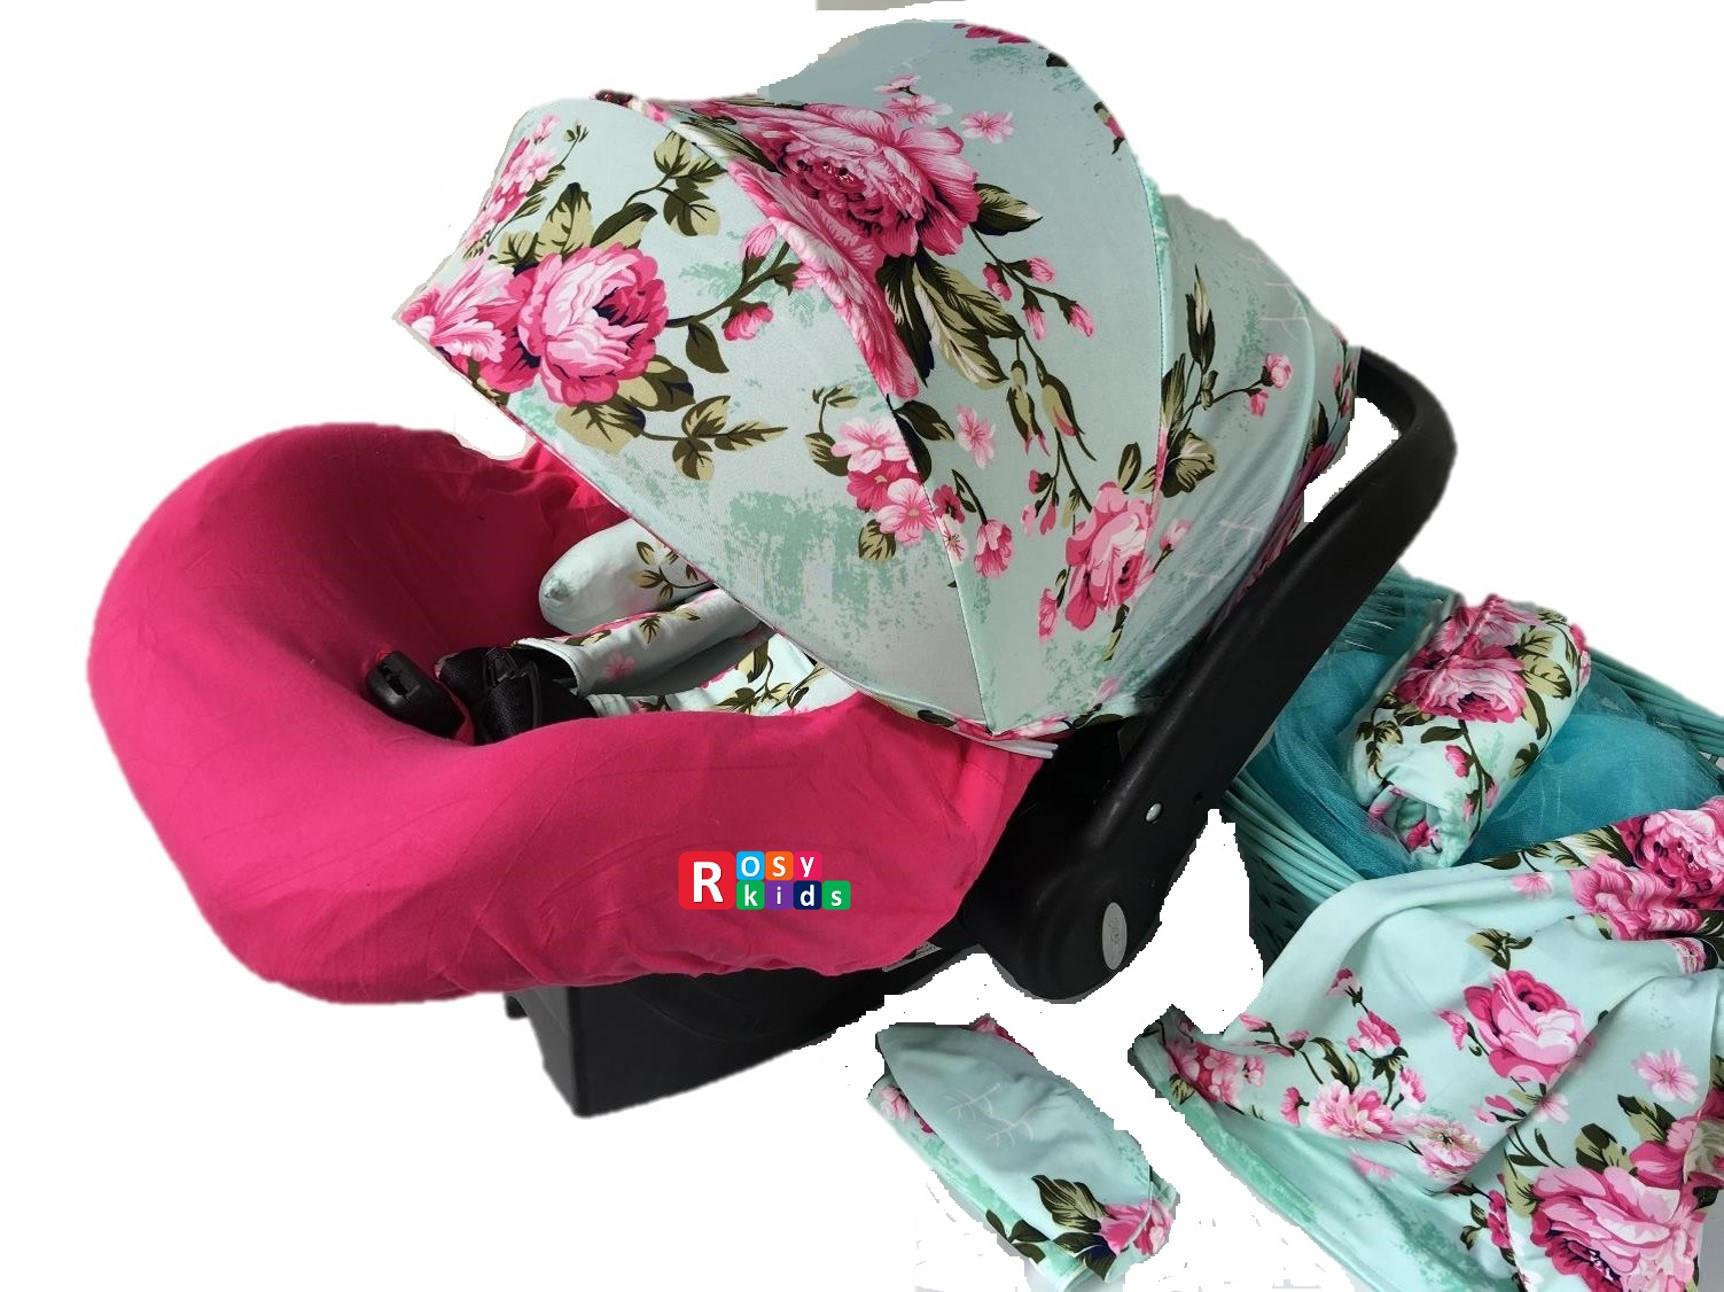 9pc Baby Boy Girl Ultimate Set Of Infant Car Seat Cover Canopy Headrest Blanket Hat Nursing Scarf